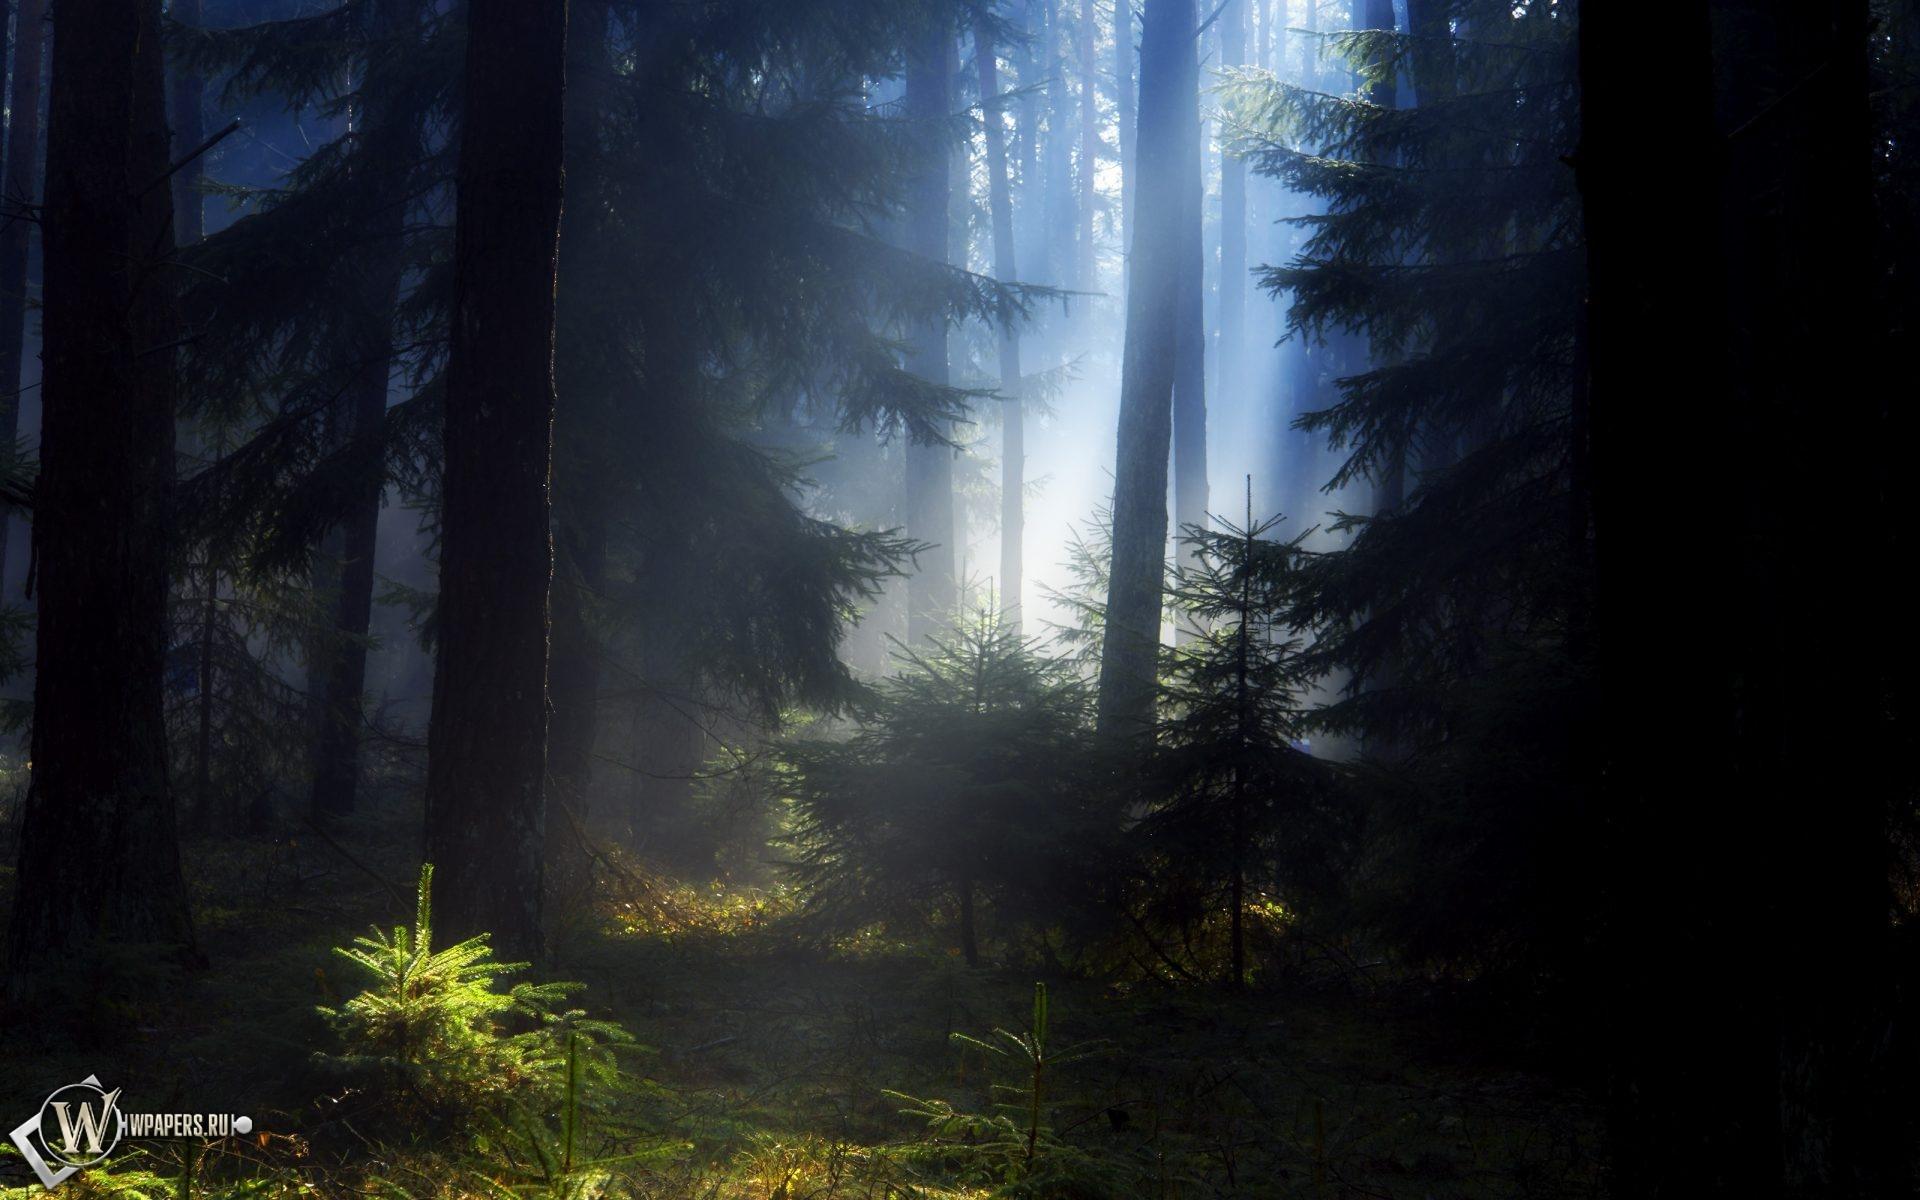 Еловый лес 1920x1200